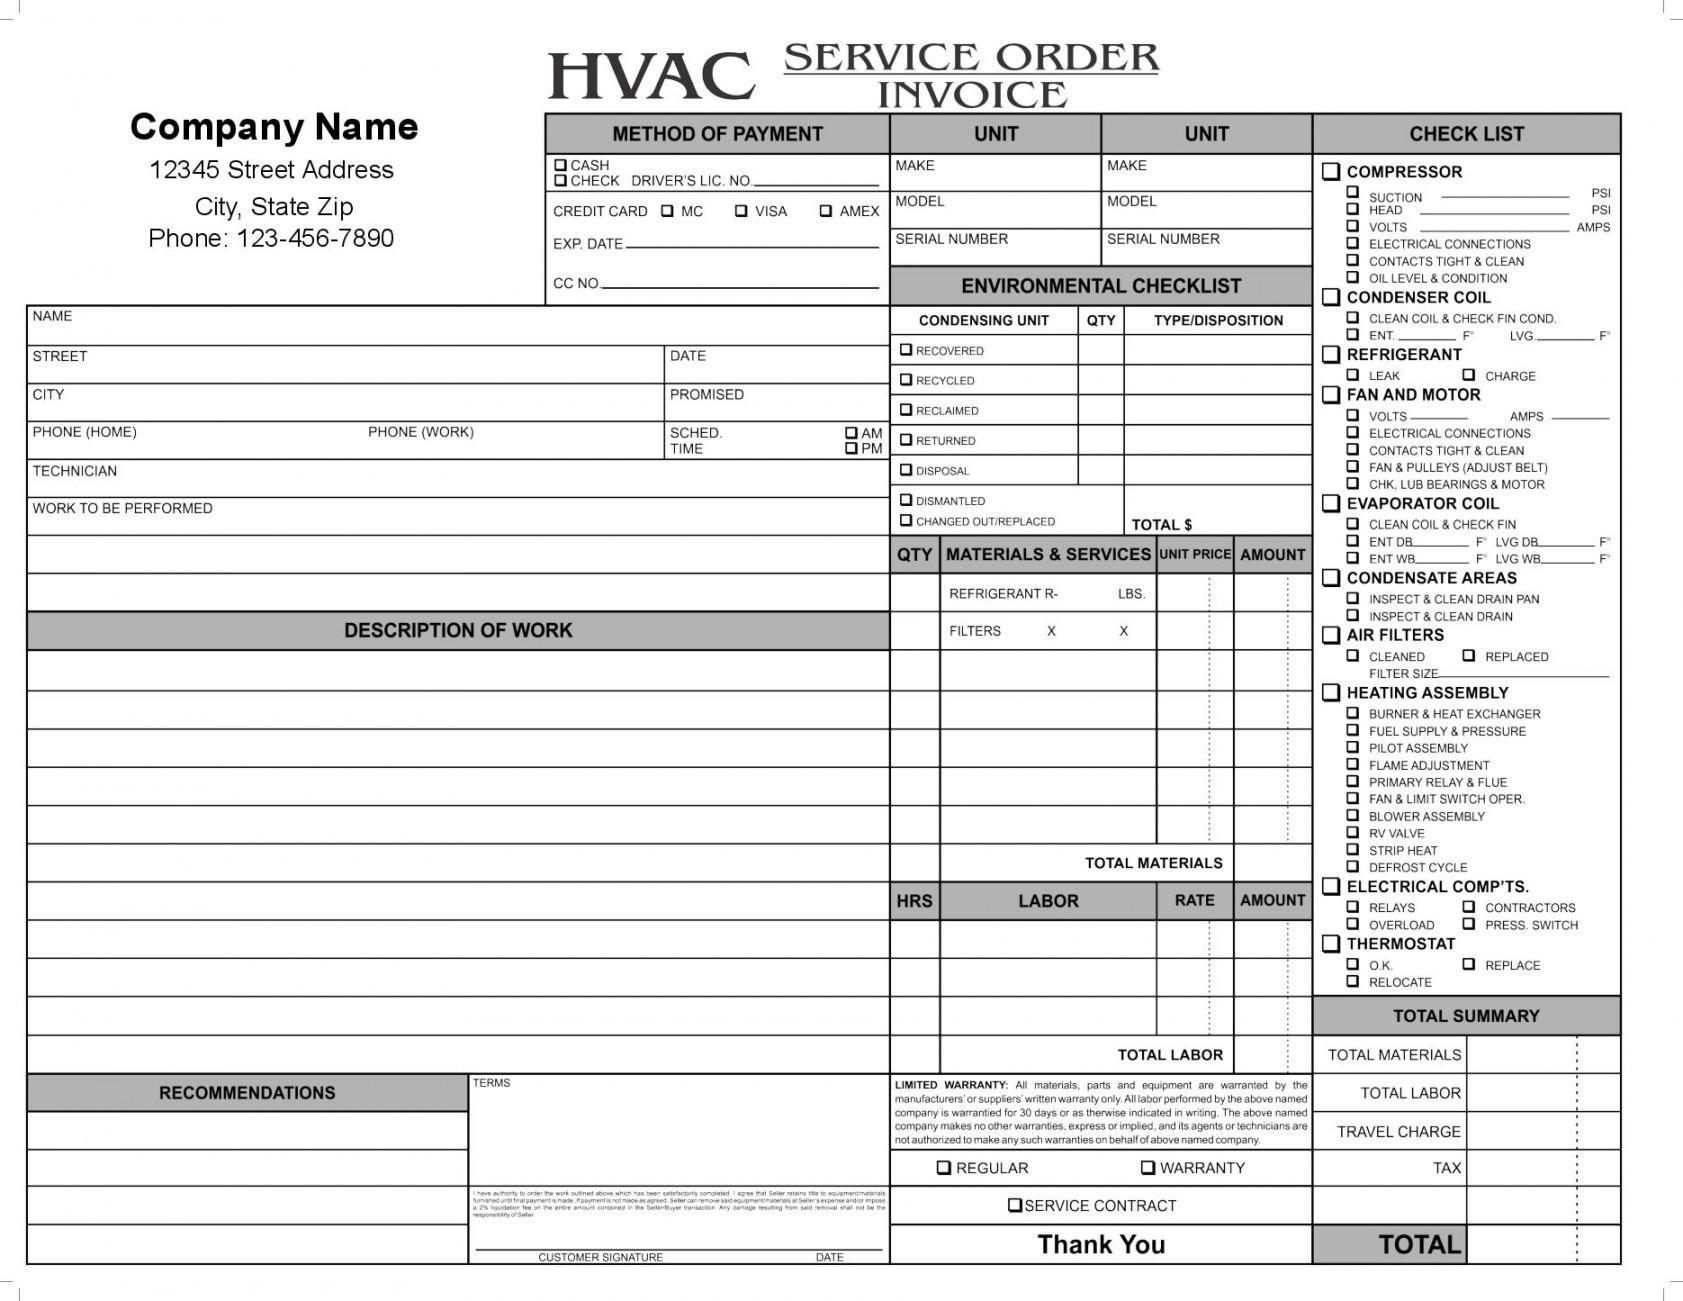 printable hvac invoice template invoice template free 2016 hvac air  conditioning estimate t...   Hvac services, Hvac jobs, Invoice template   Hvac Drawing Templates      Pinterest